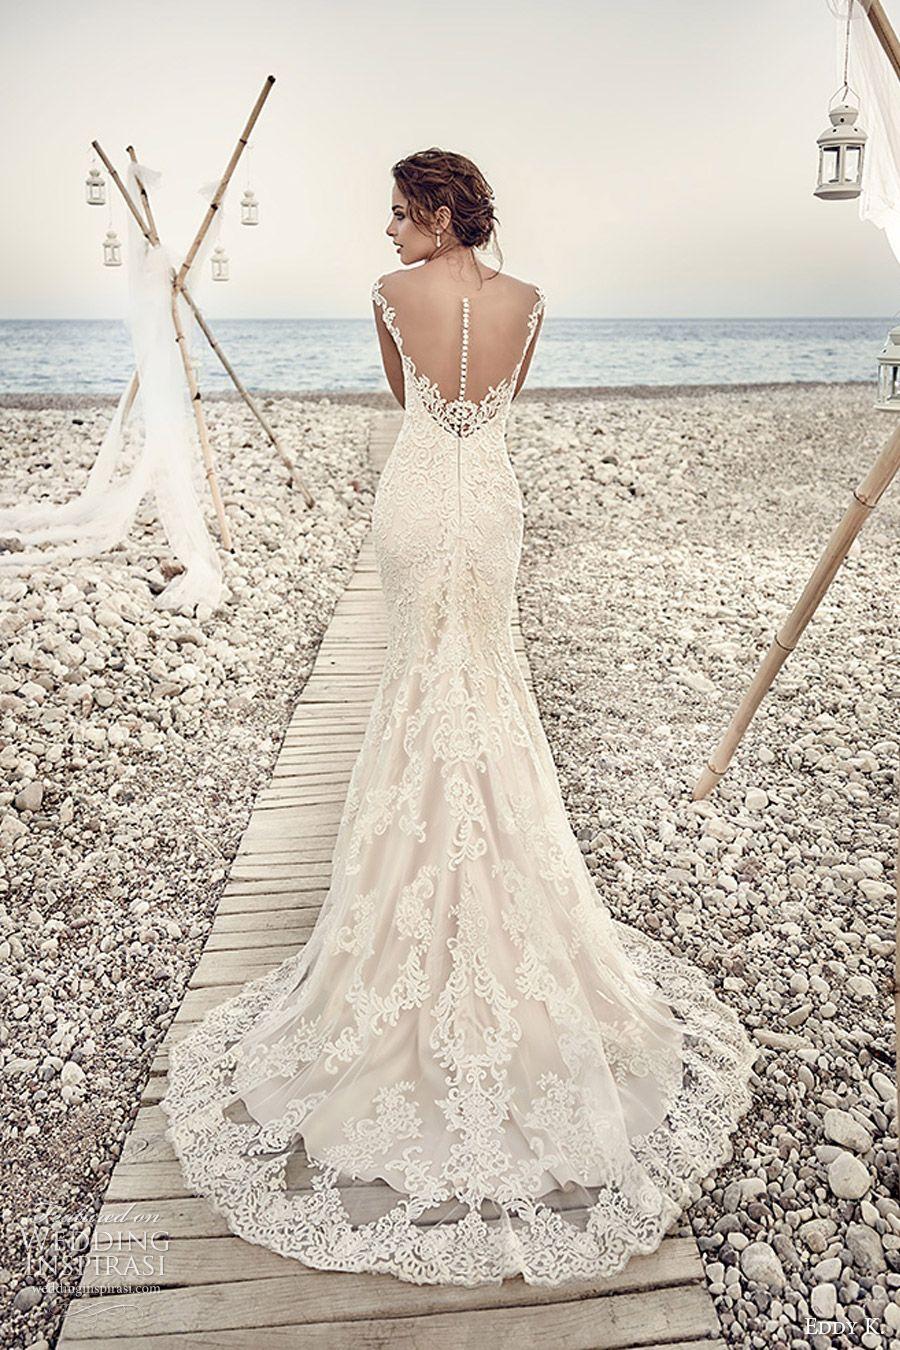 Eddie wedding dress